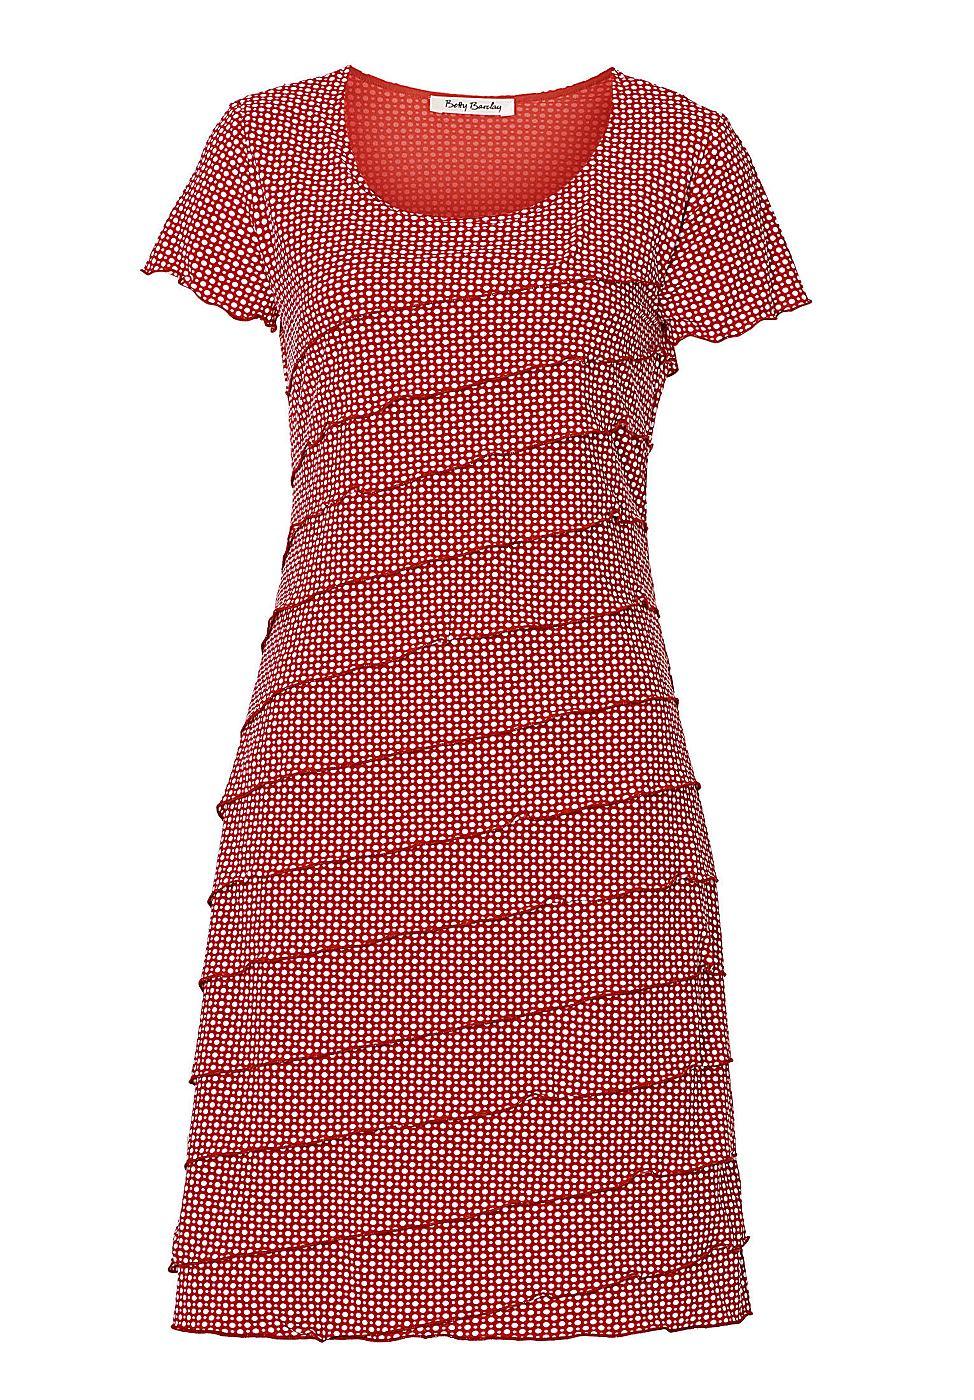 Betty Barclay jurk rood